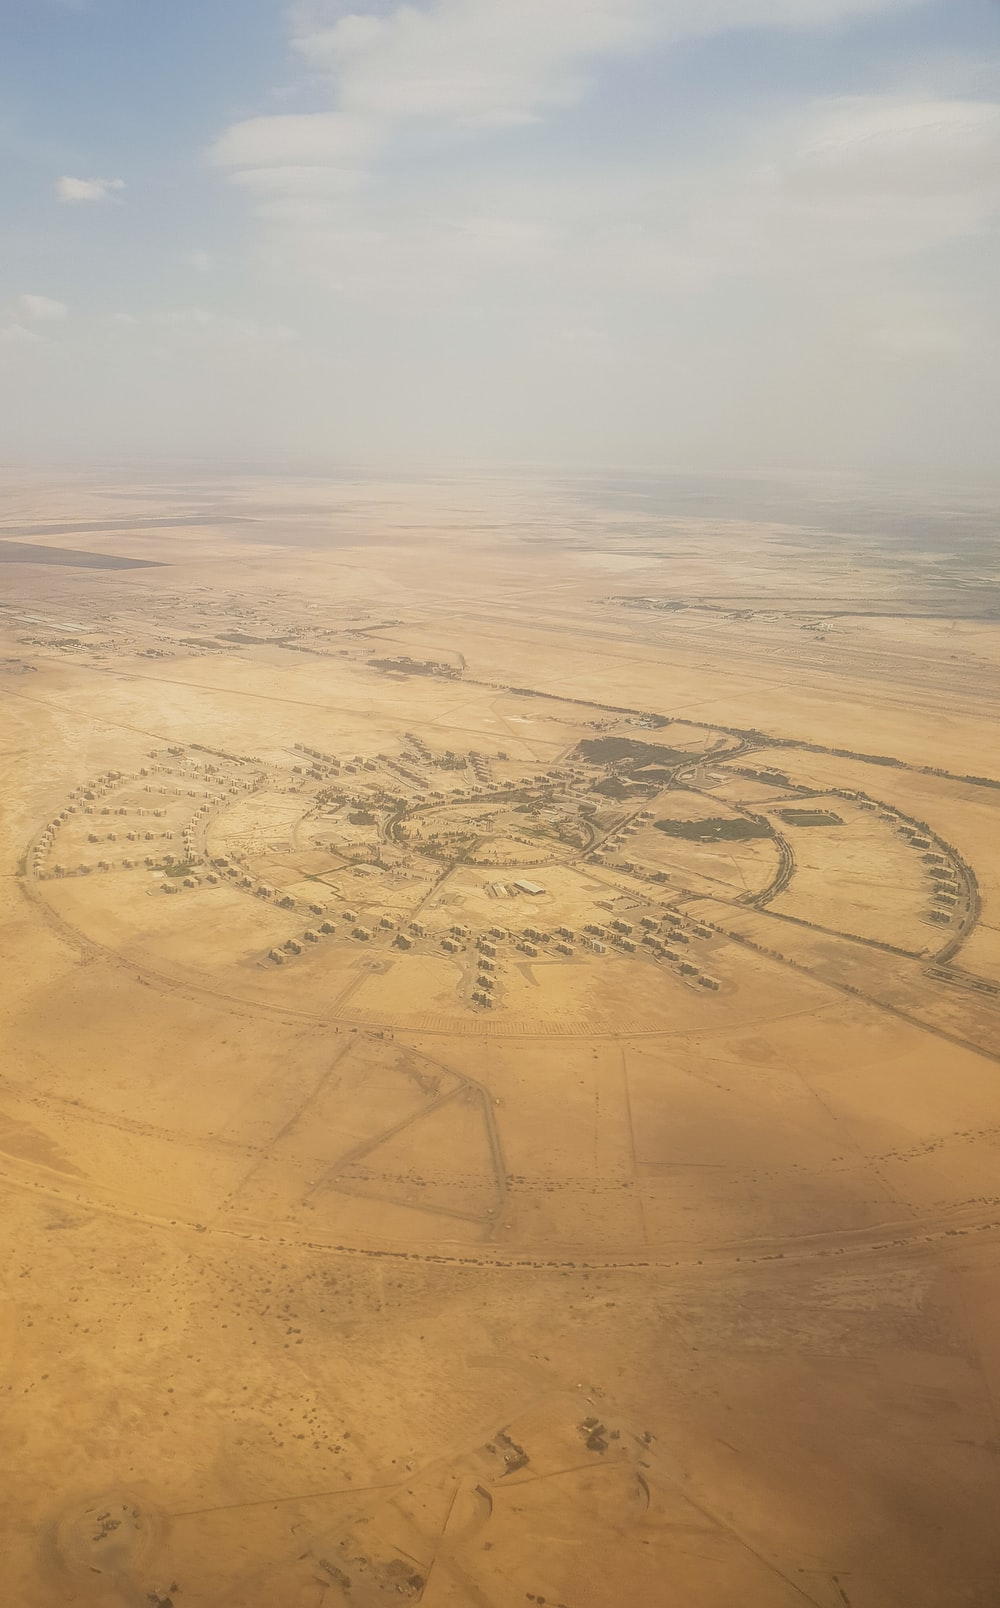 aerial view of crop circle